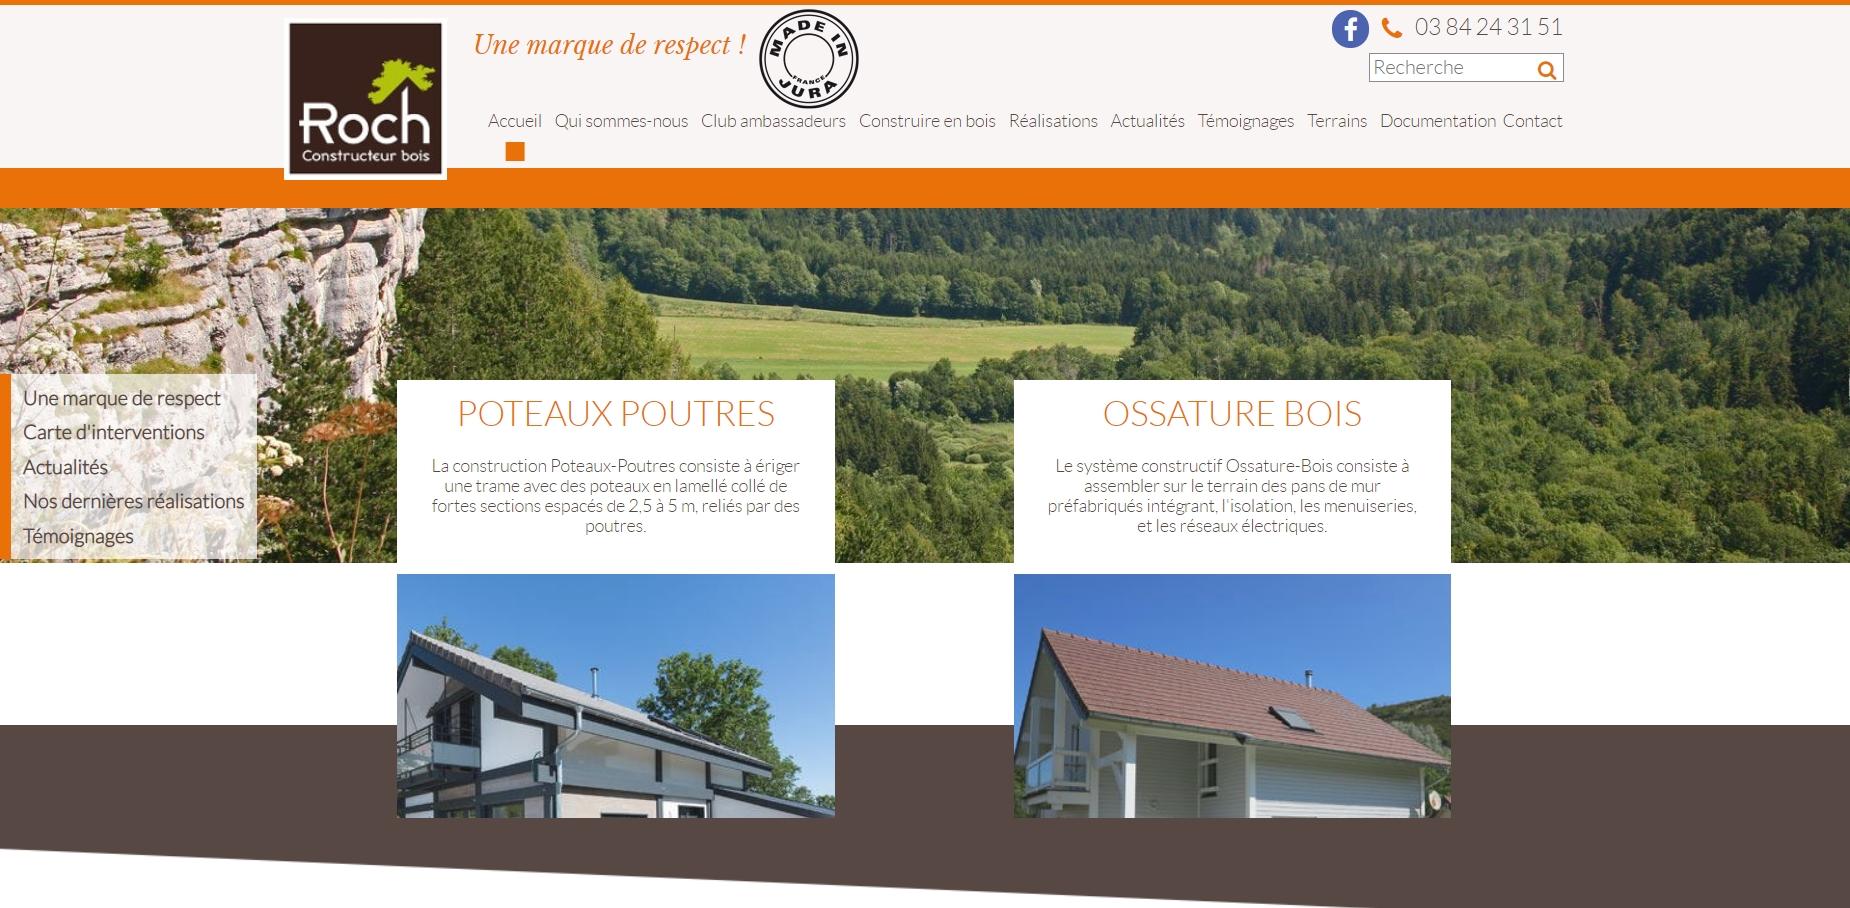 Roch constructeur maisons Bois Jura, Annecy, Bourgogne